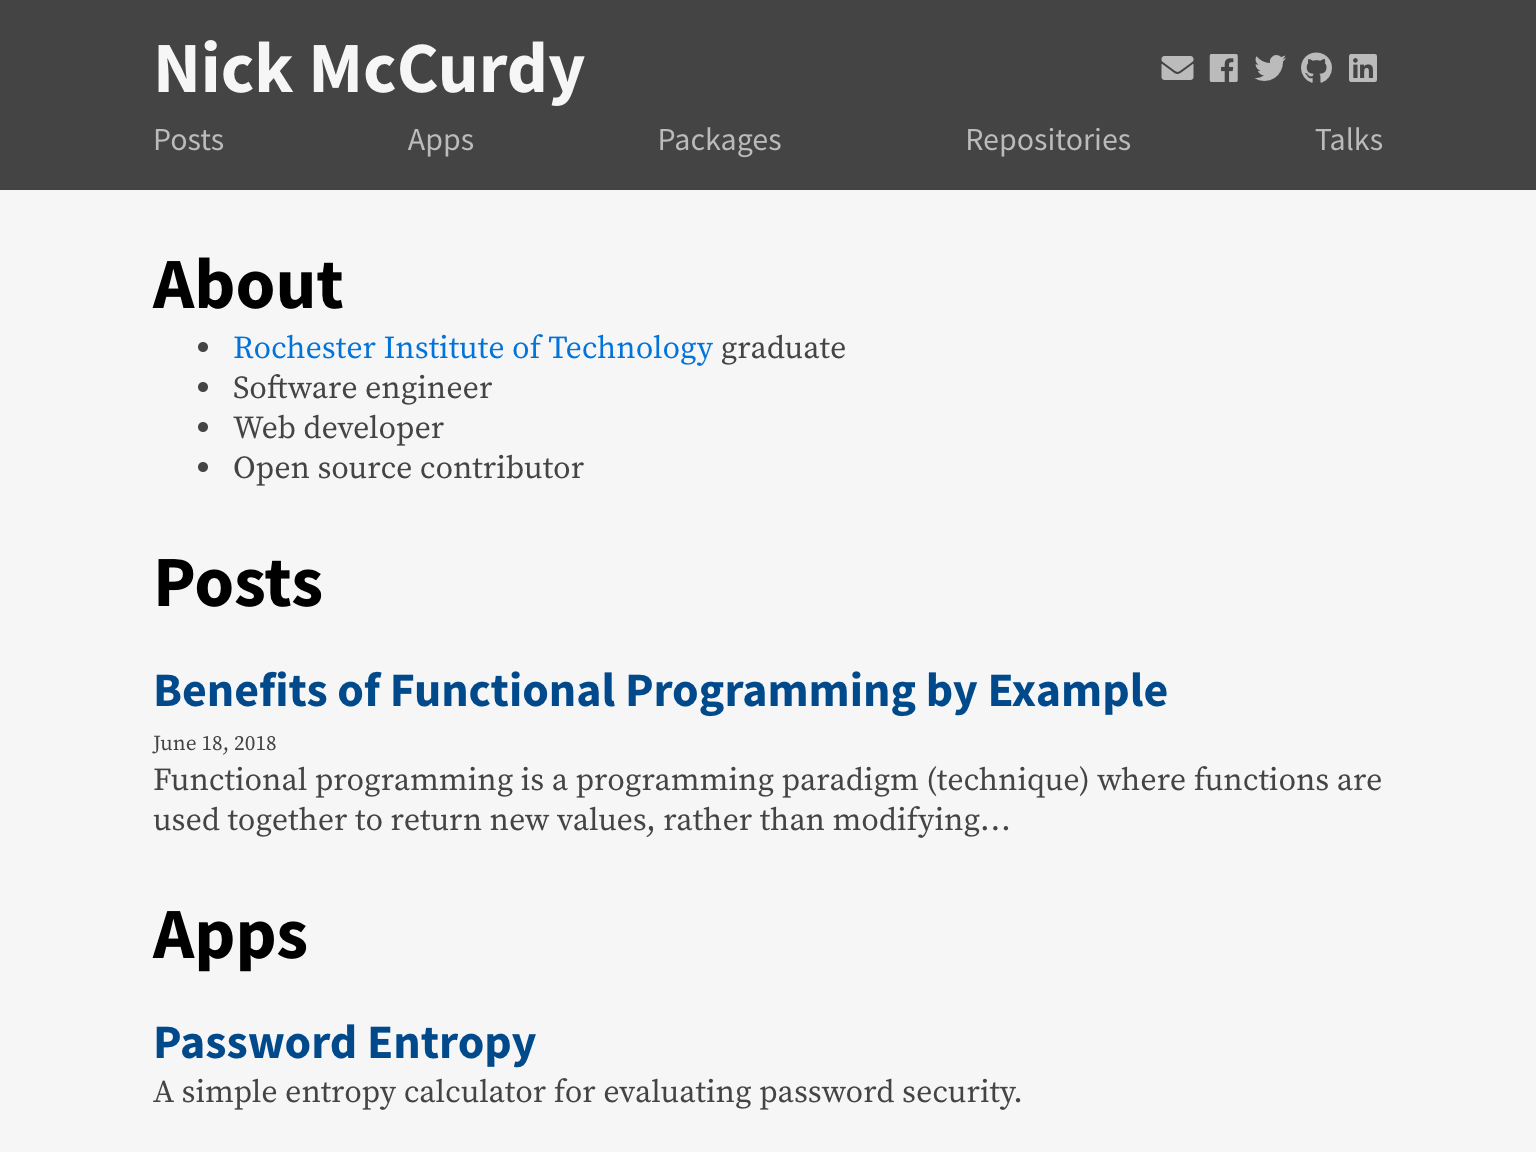 nickmccurdy com by Nick McCurdy | Dribbble | Dribbble